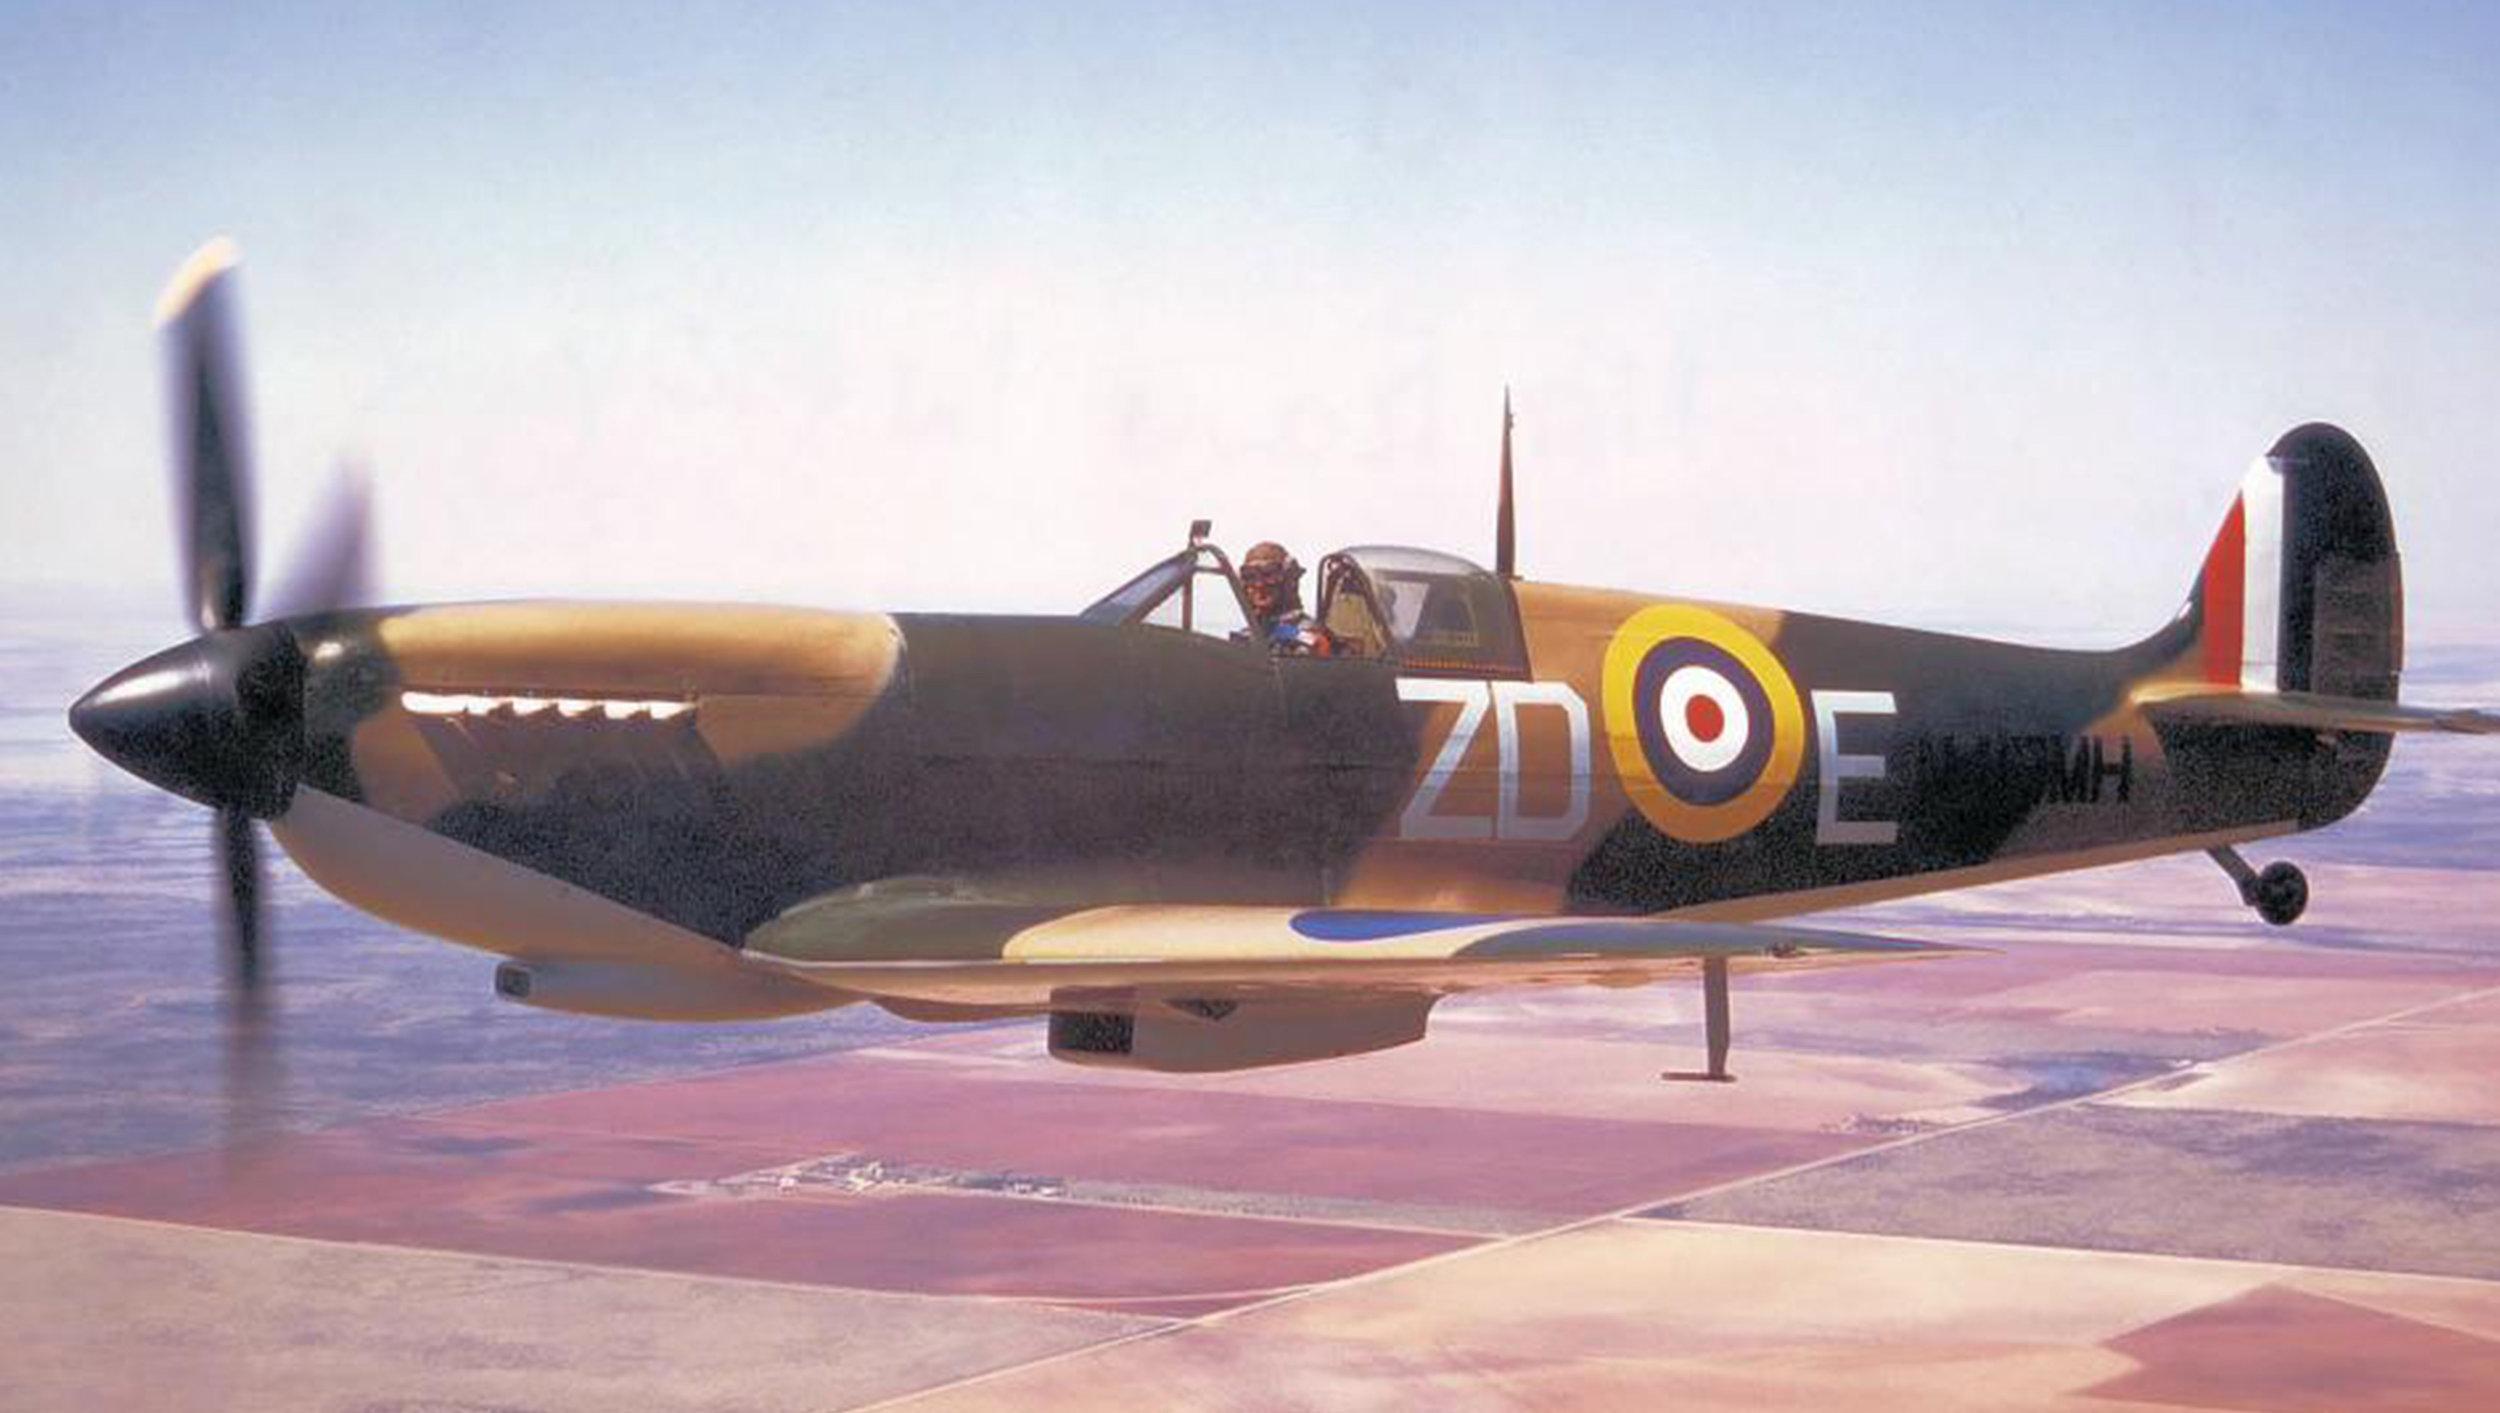 Spitfire MH415 is in the workshops of VFR.